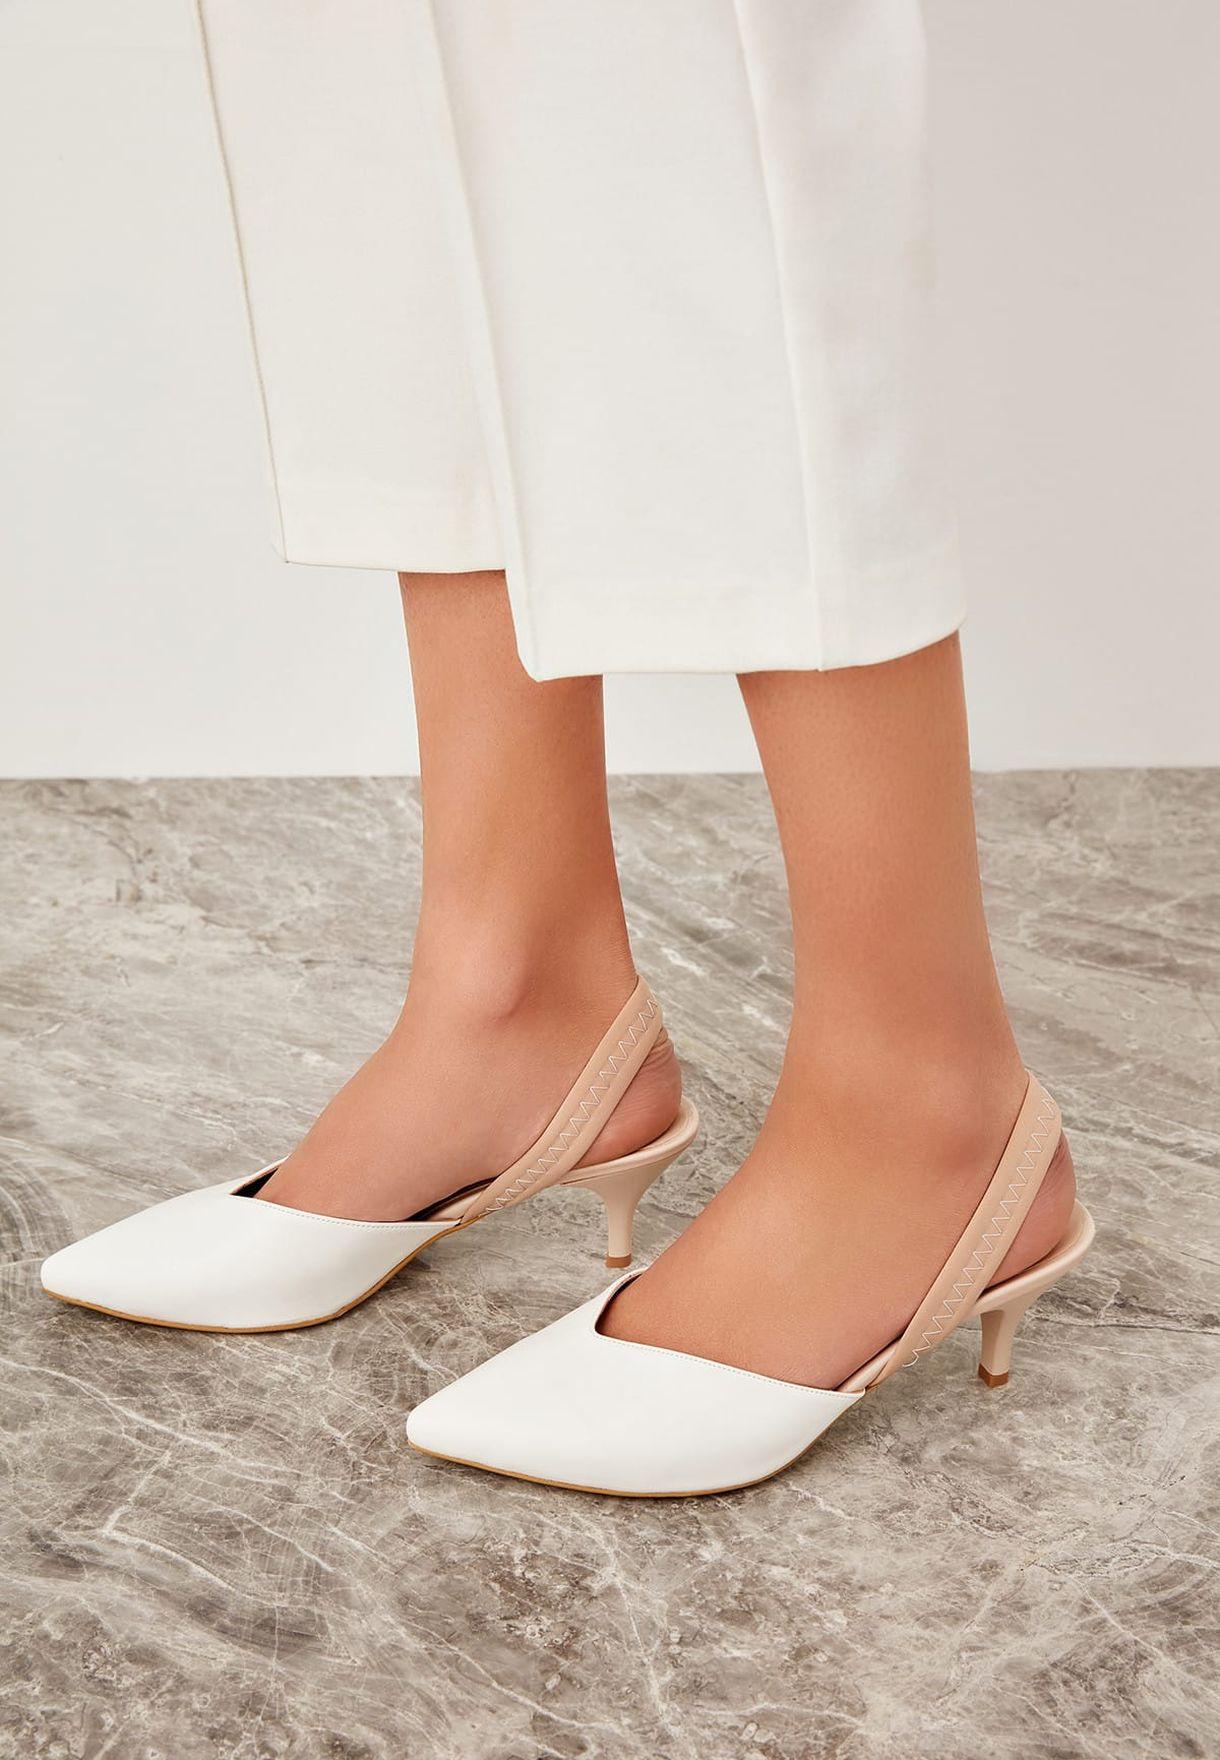 Buy Trendyol white Kitten Heel Pump